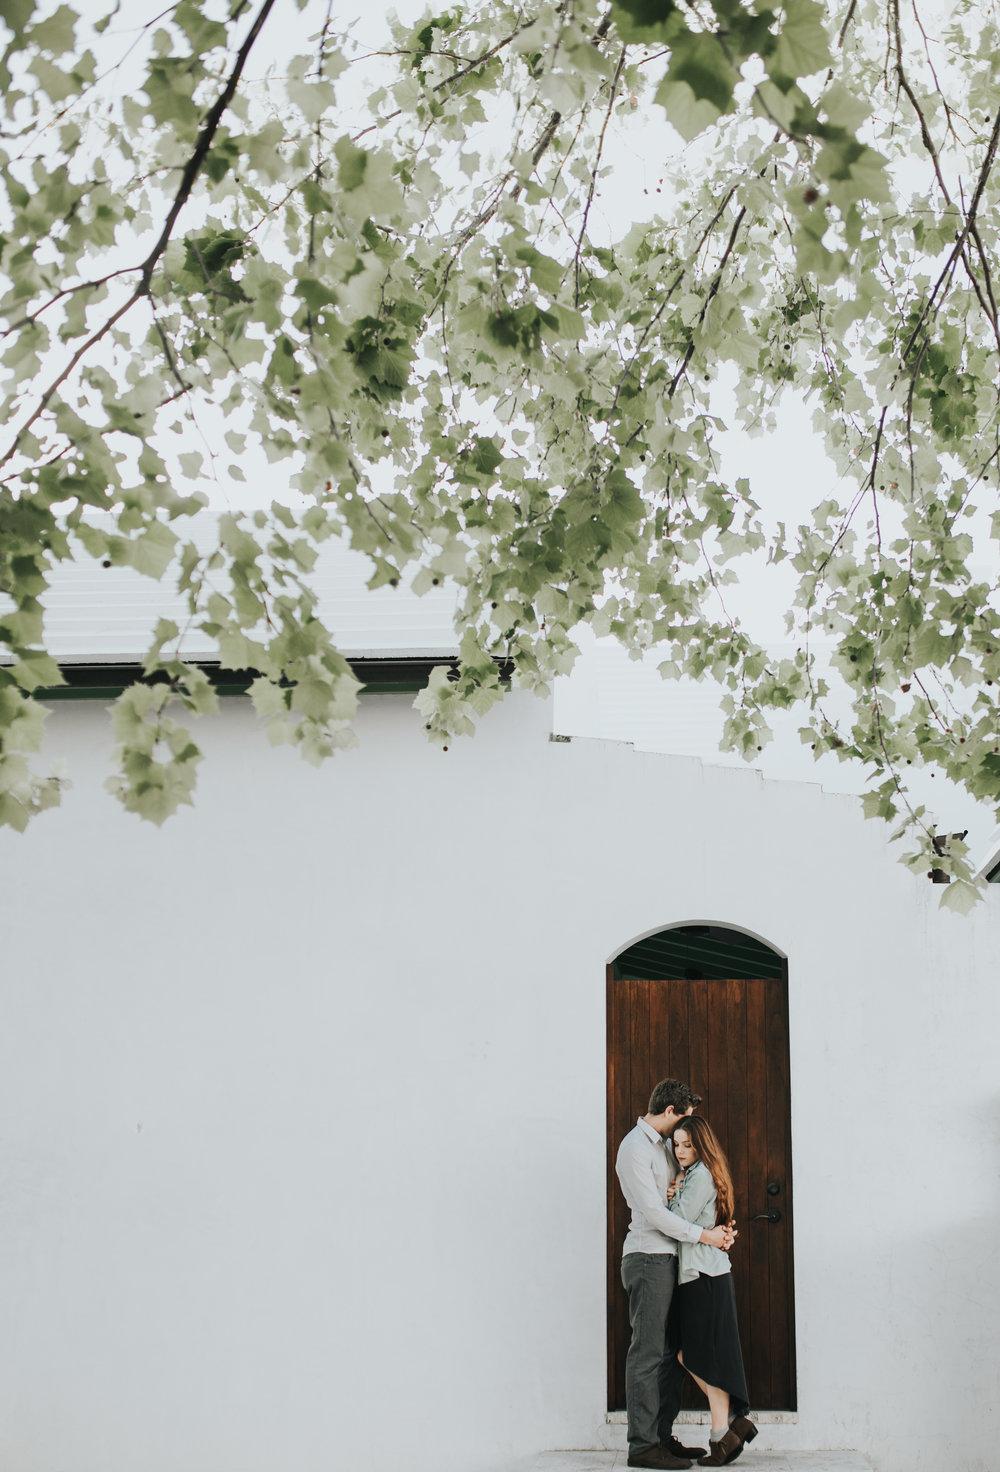 panama-city-beach-florida-wedding-photography-olivia-chandler-engagement-124.jpg